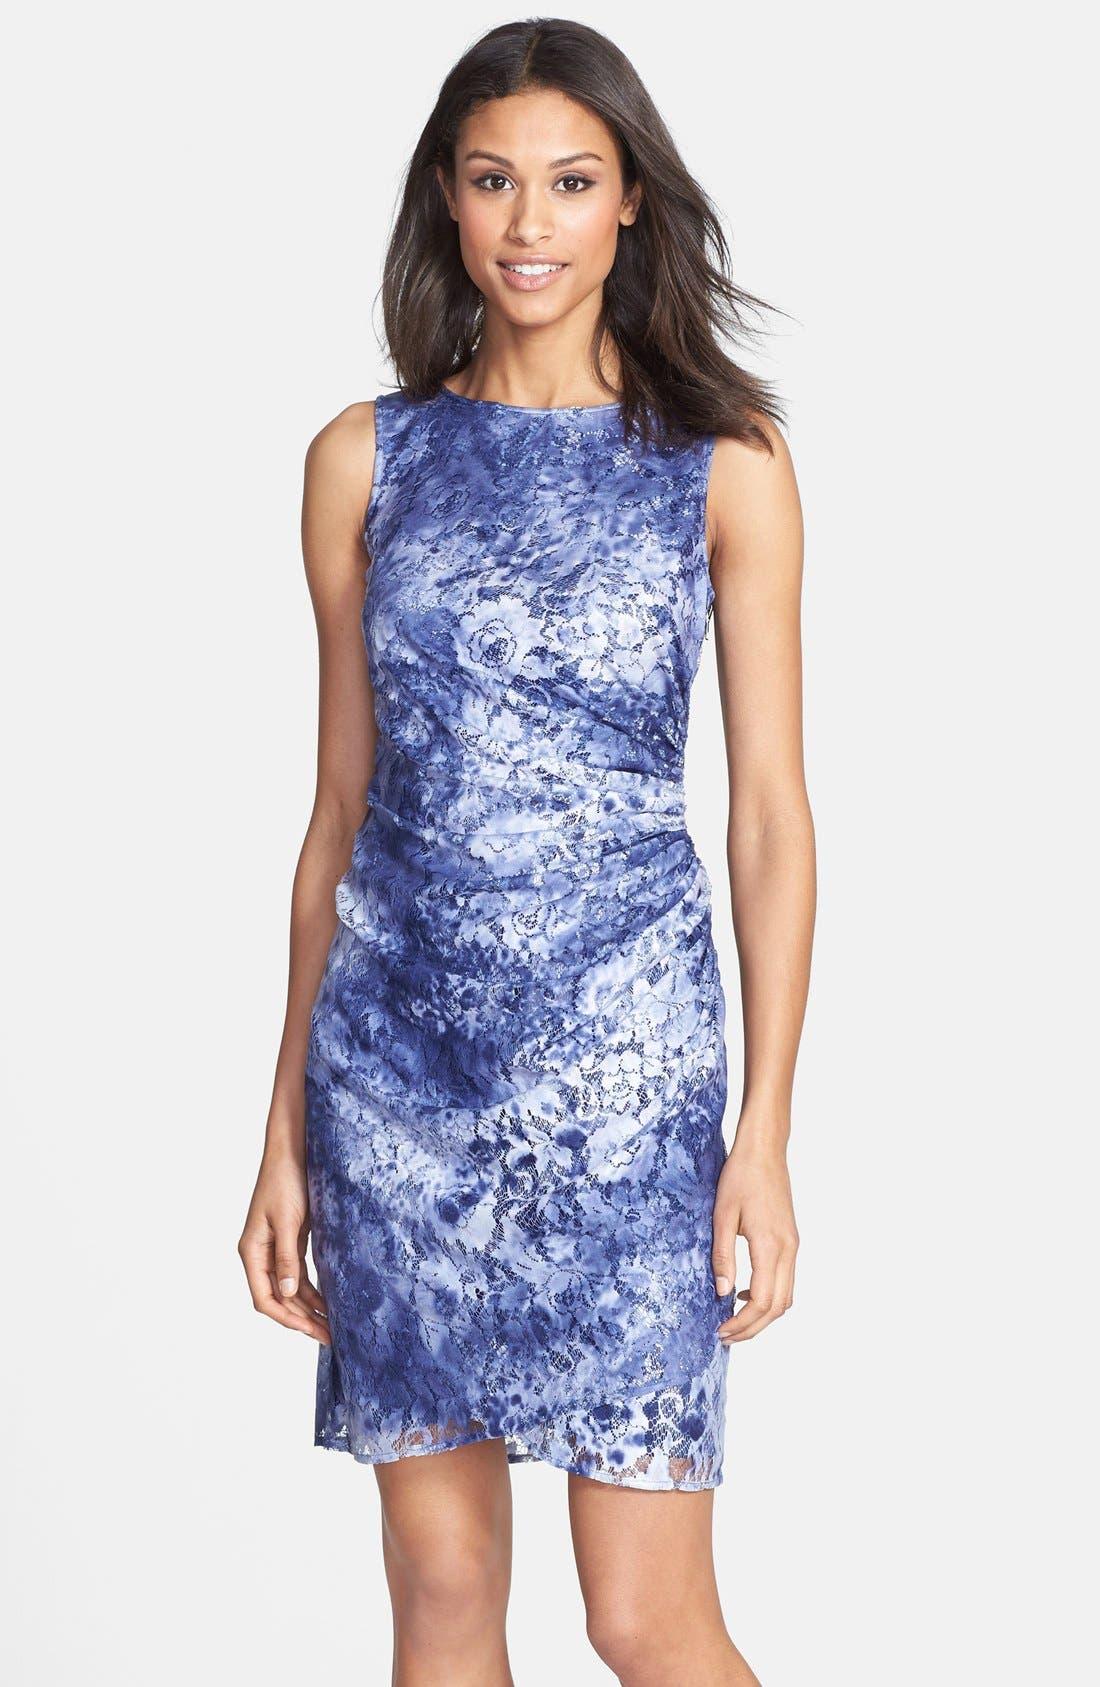 Alternate Image 1 Selected - Adrianna Papell Tie Dye Lace Sheath Dress (Regular & Petite)